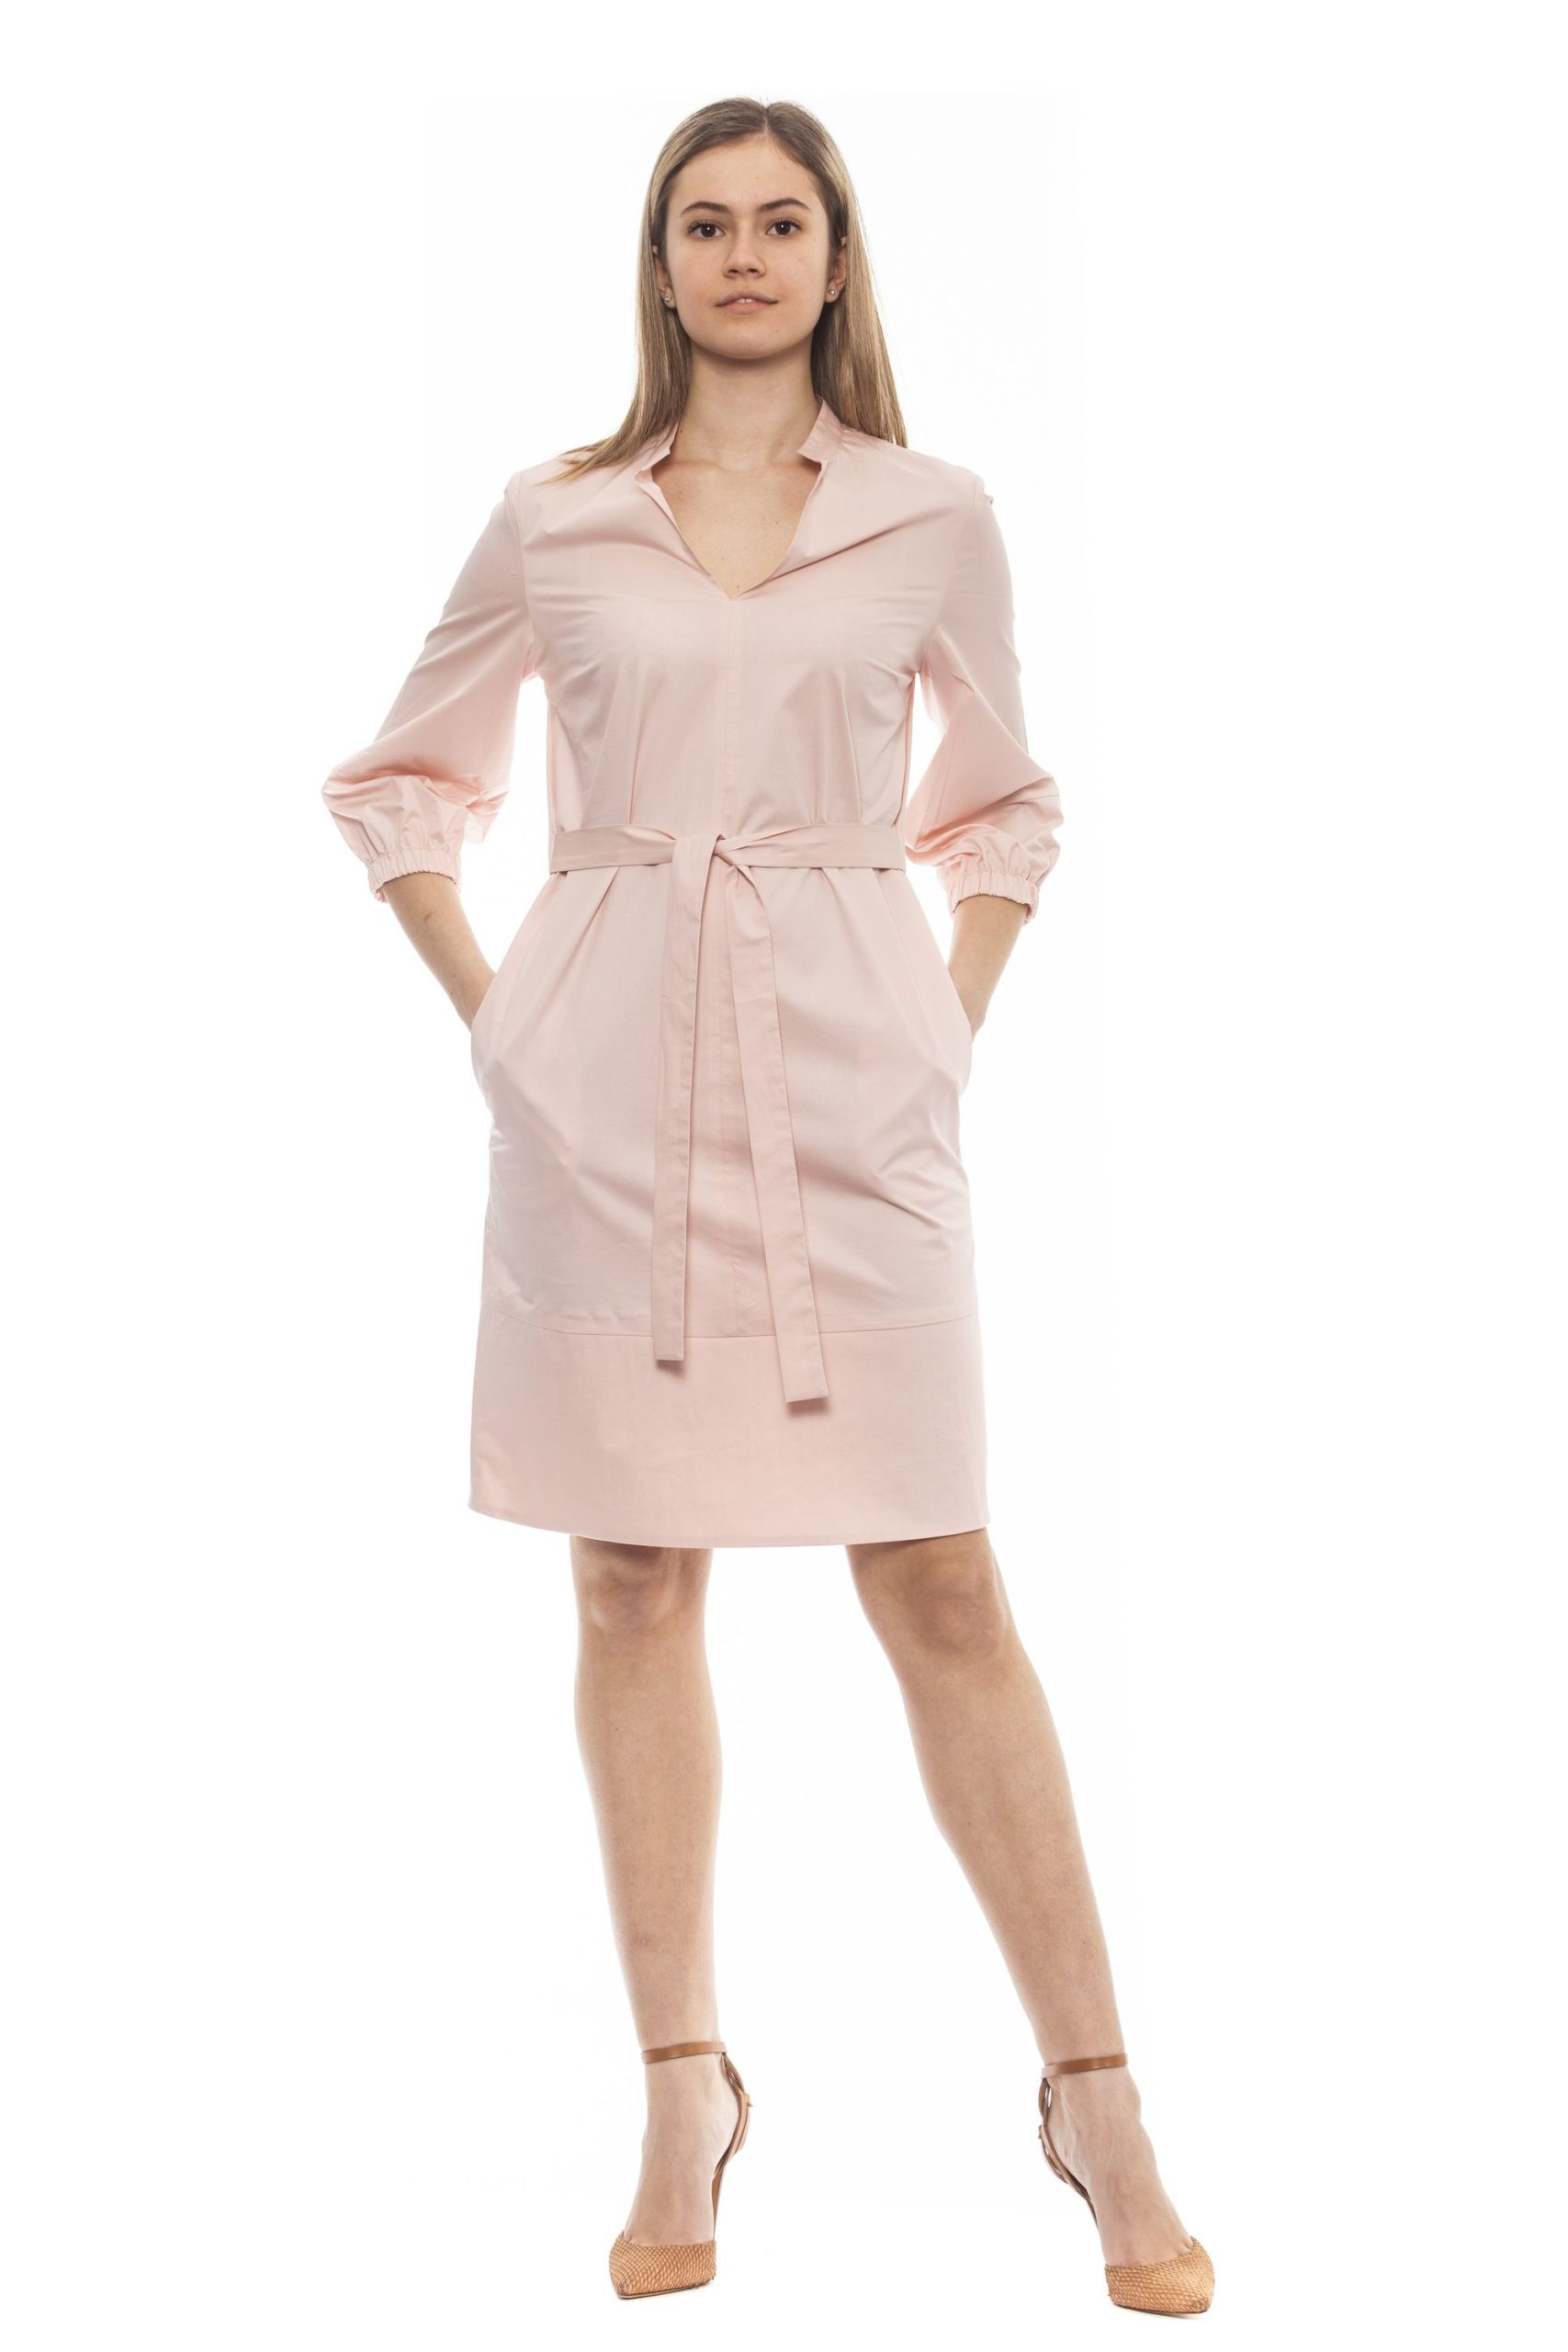 Peserico Women's Rosa Dress Pink PE1381701 - IT42 | S